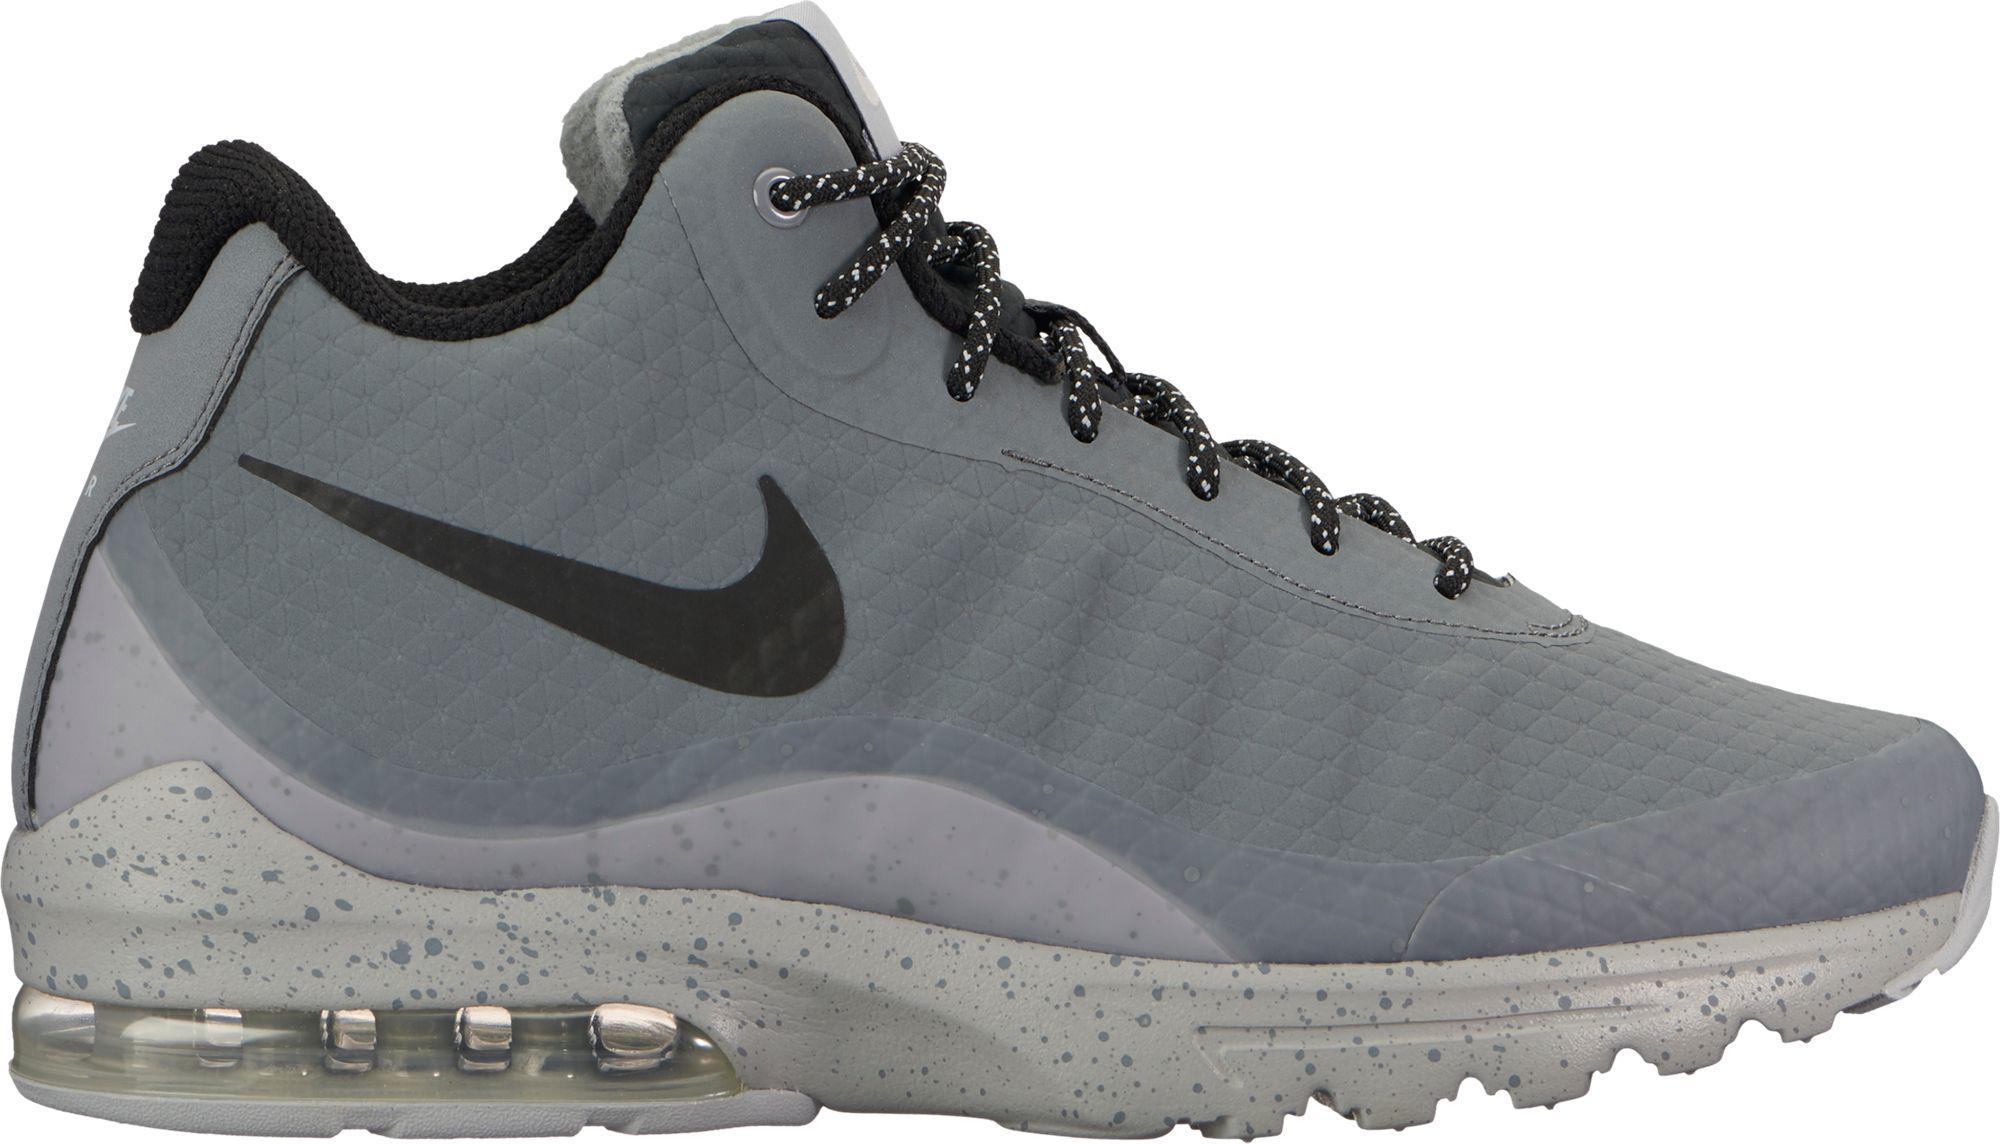 c919b4b45c Nike Air Max Invigor Mid Shoes in Gray for Men - Lyst